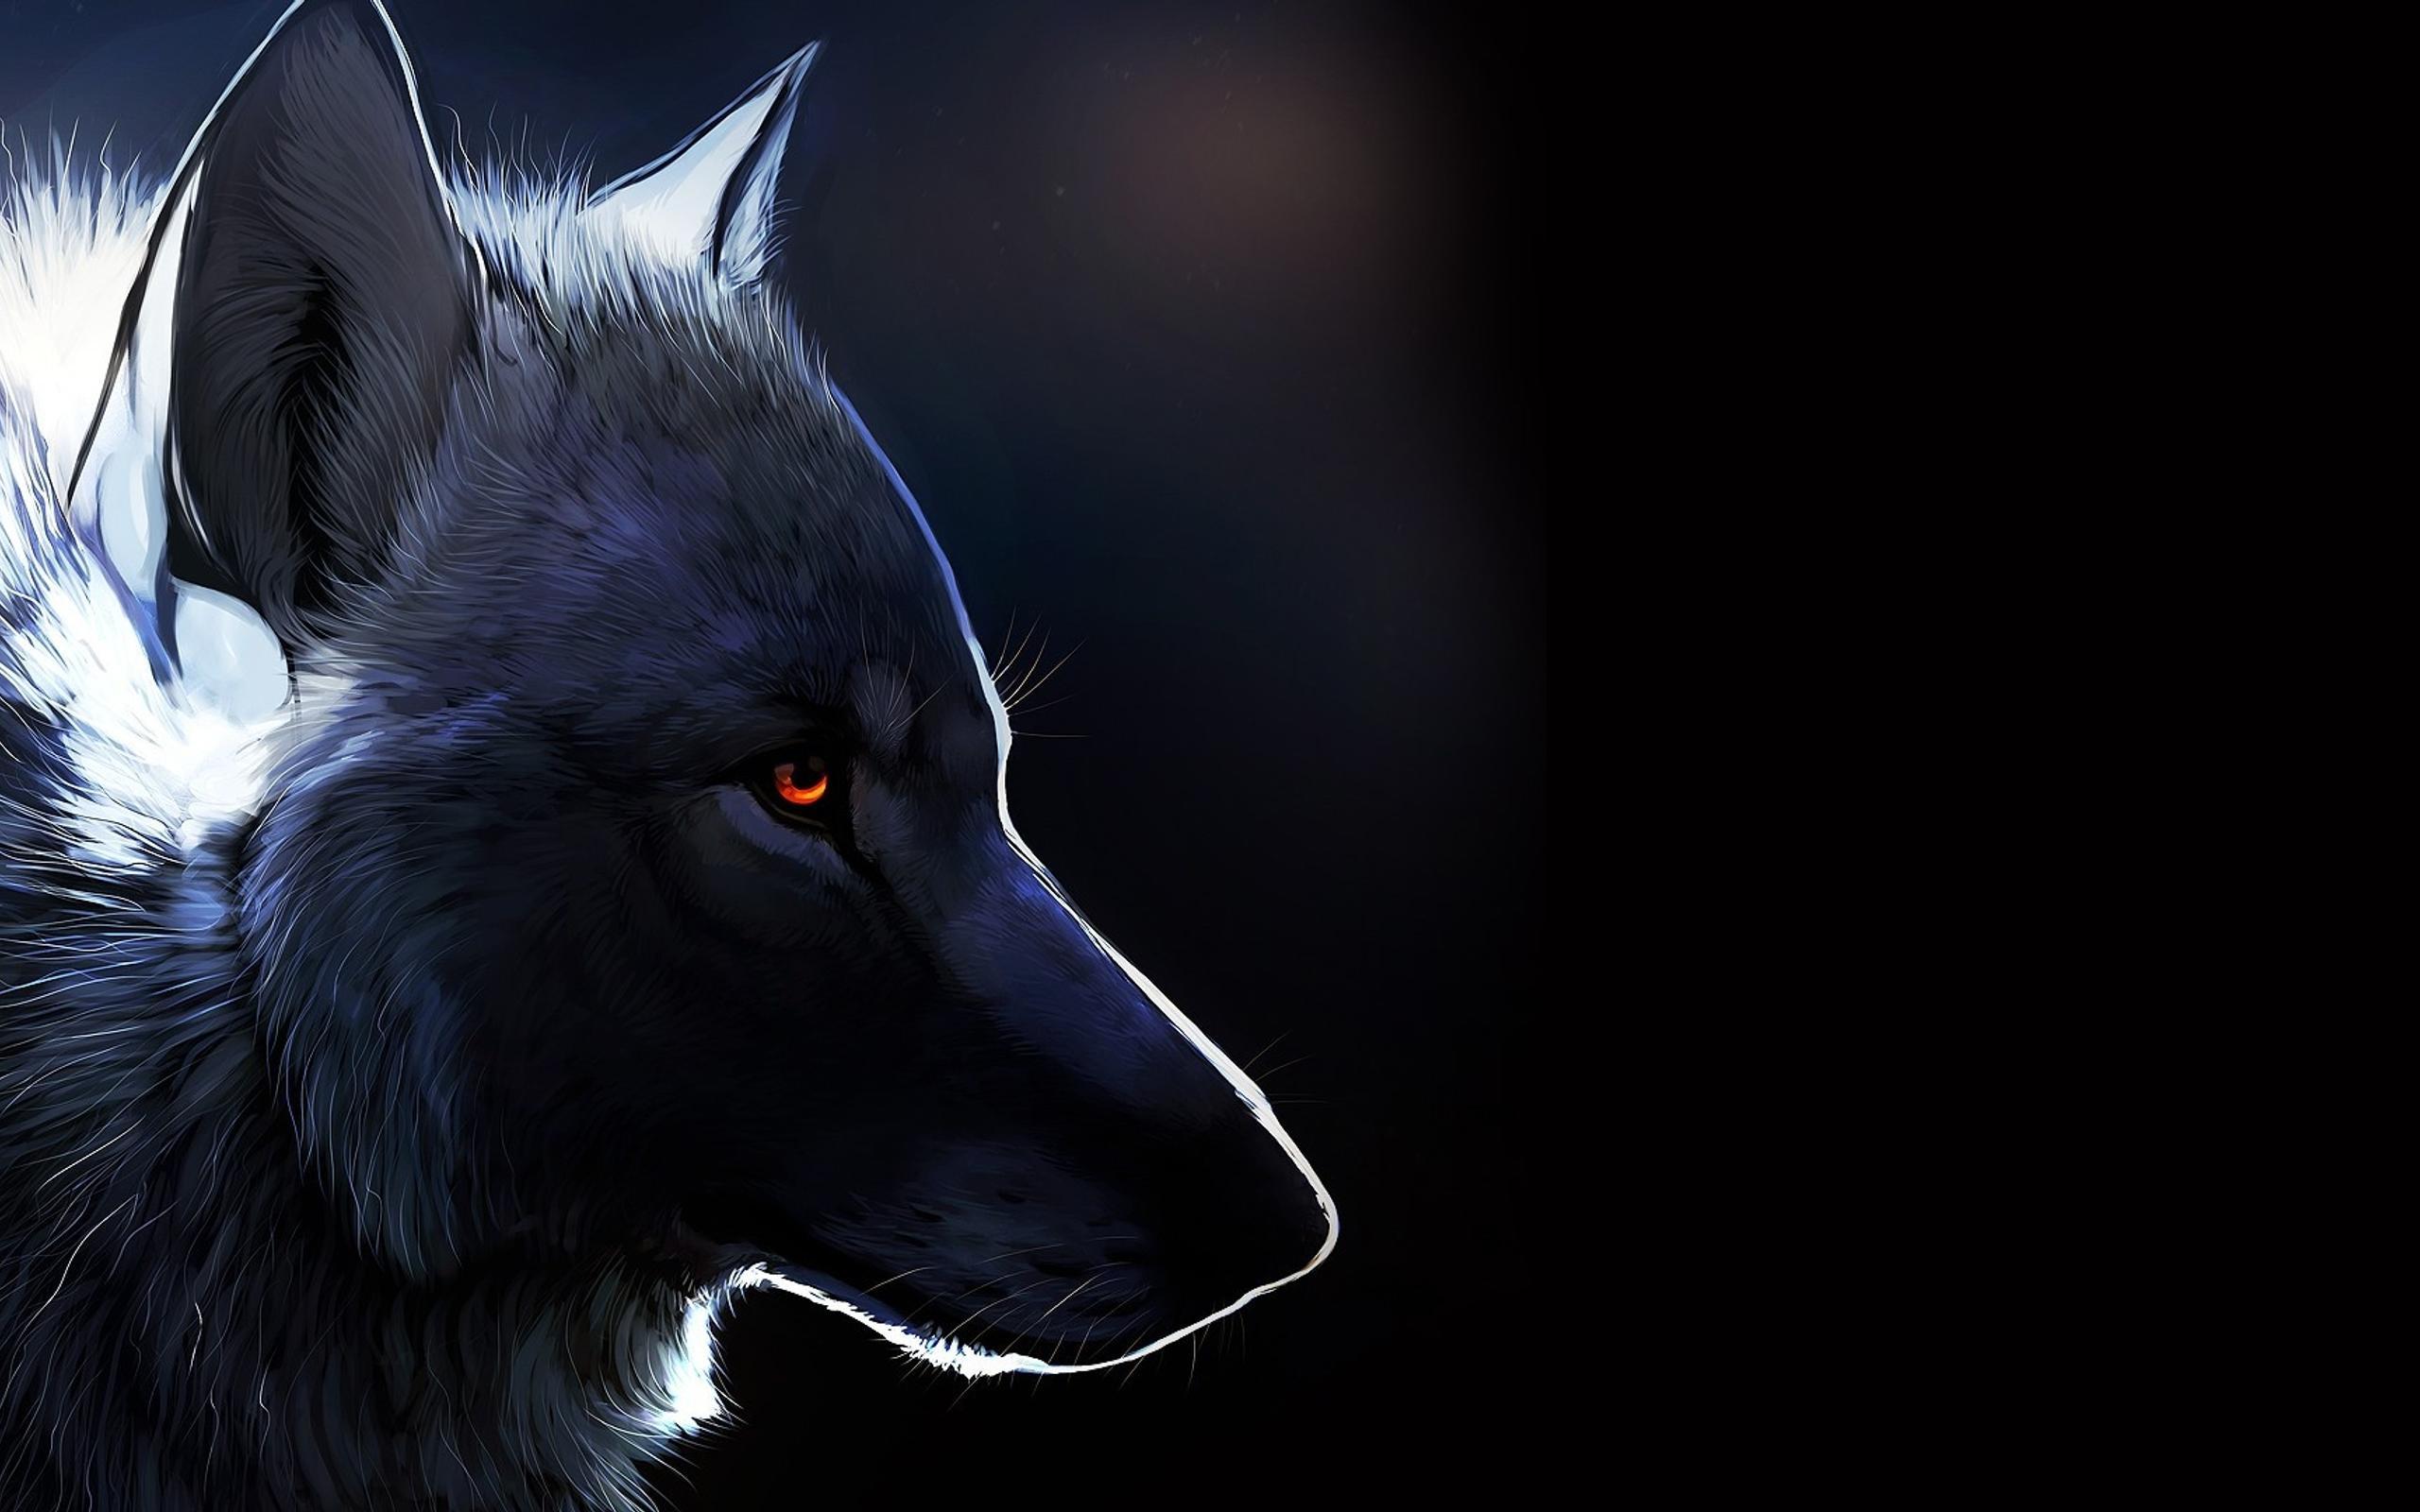 Amazing Wallpaper Macbook Wolf - black-wolf-drawing-dark-creative-wallpaper-2560x1600  Picture_894020.jpg